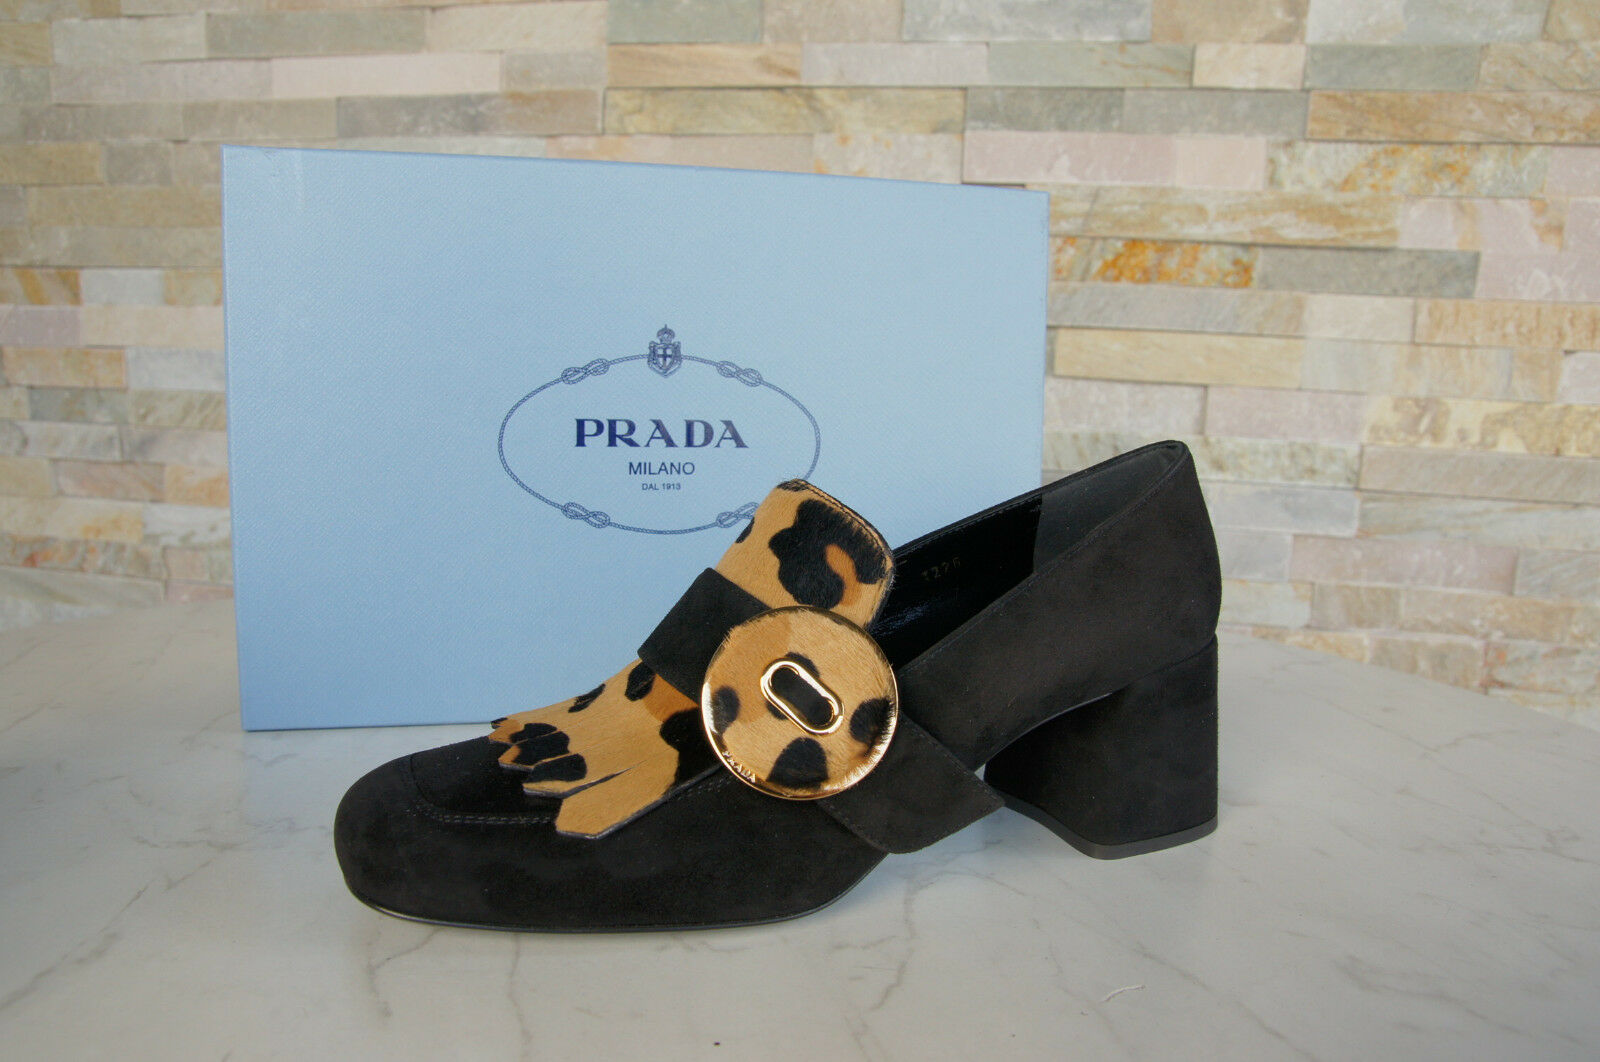 Luxury Prada 38,5 Pumps shoes 1D723H Calf Skin Leopard + Black New Formerly Rrp